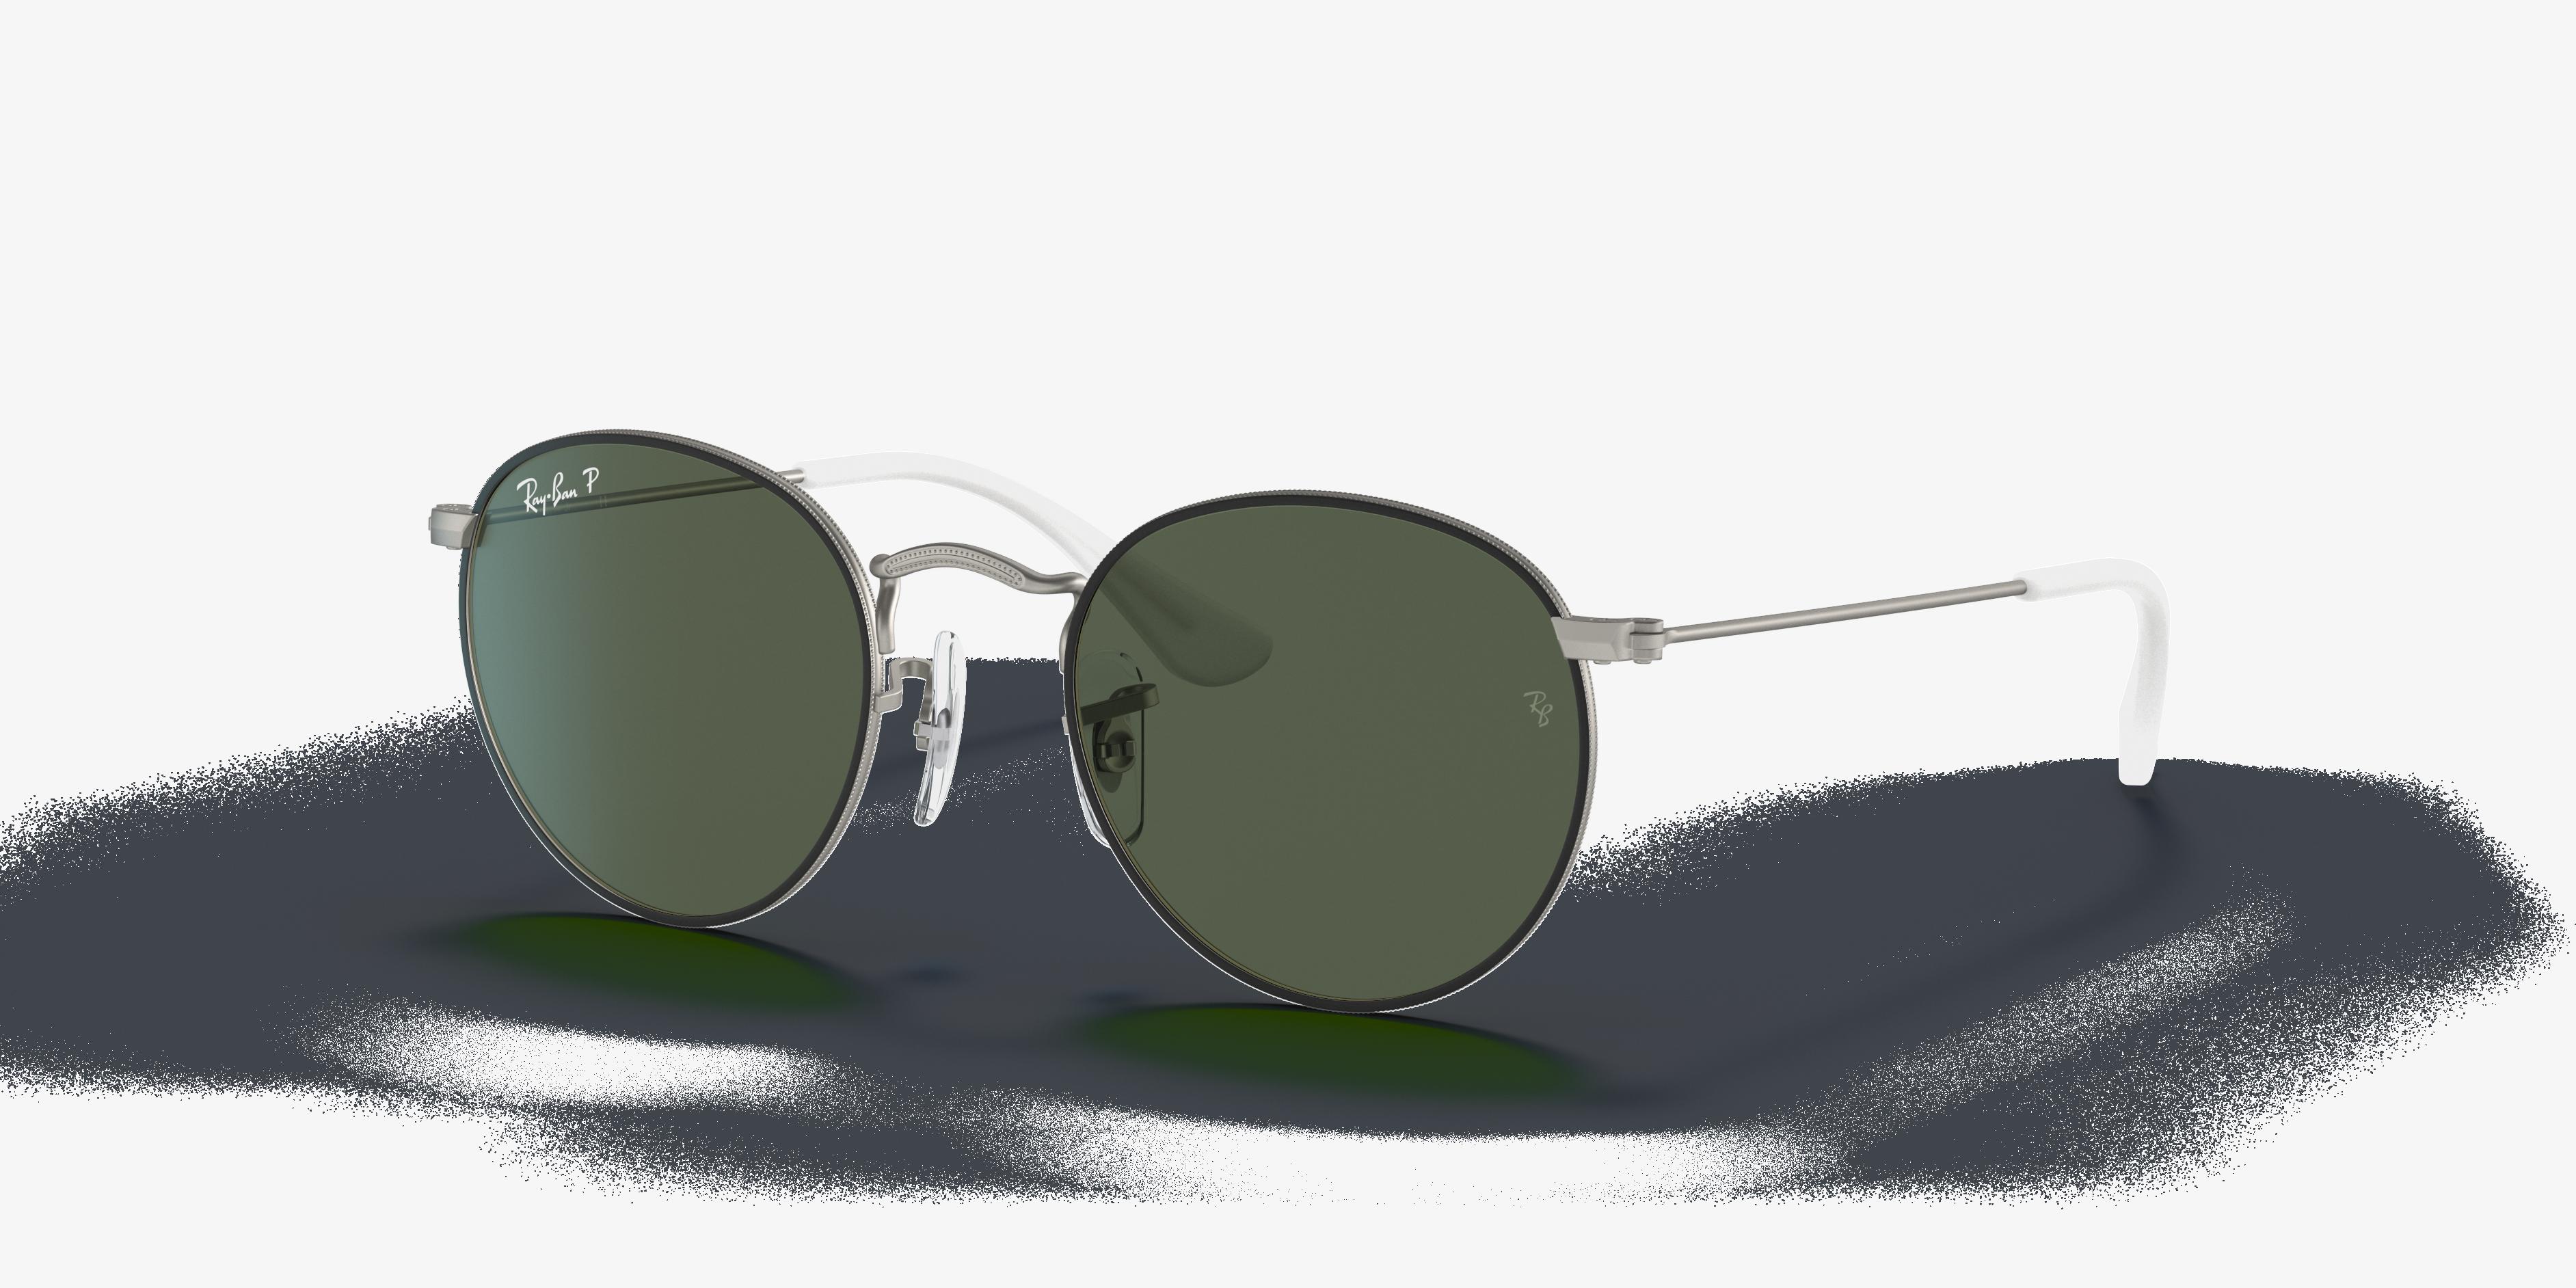 Ray-Ban Round Metal Junior Silver, Green Lenses - RJ9547S